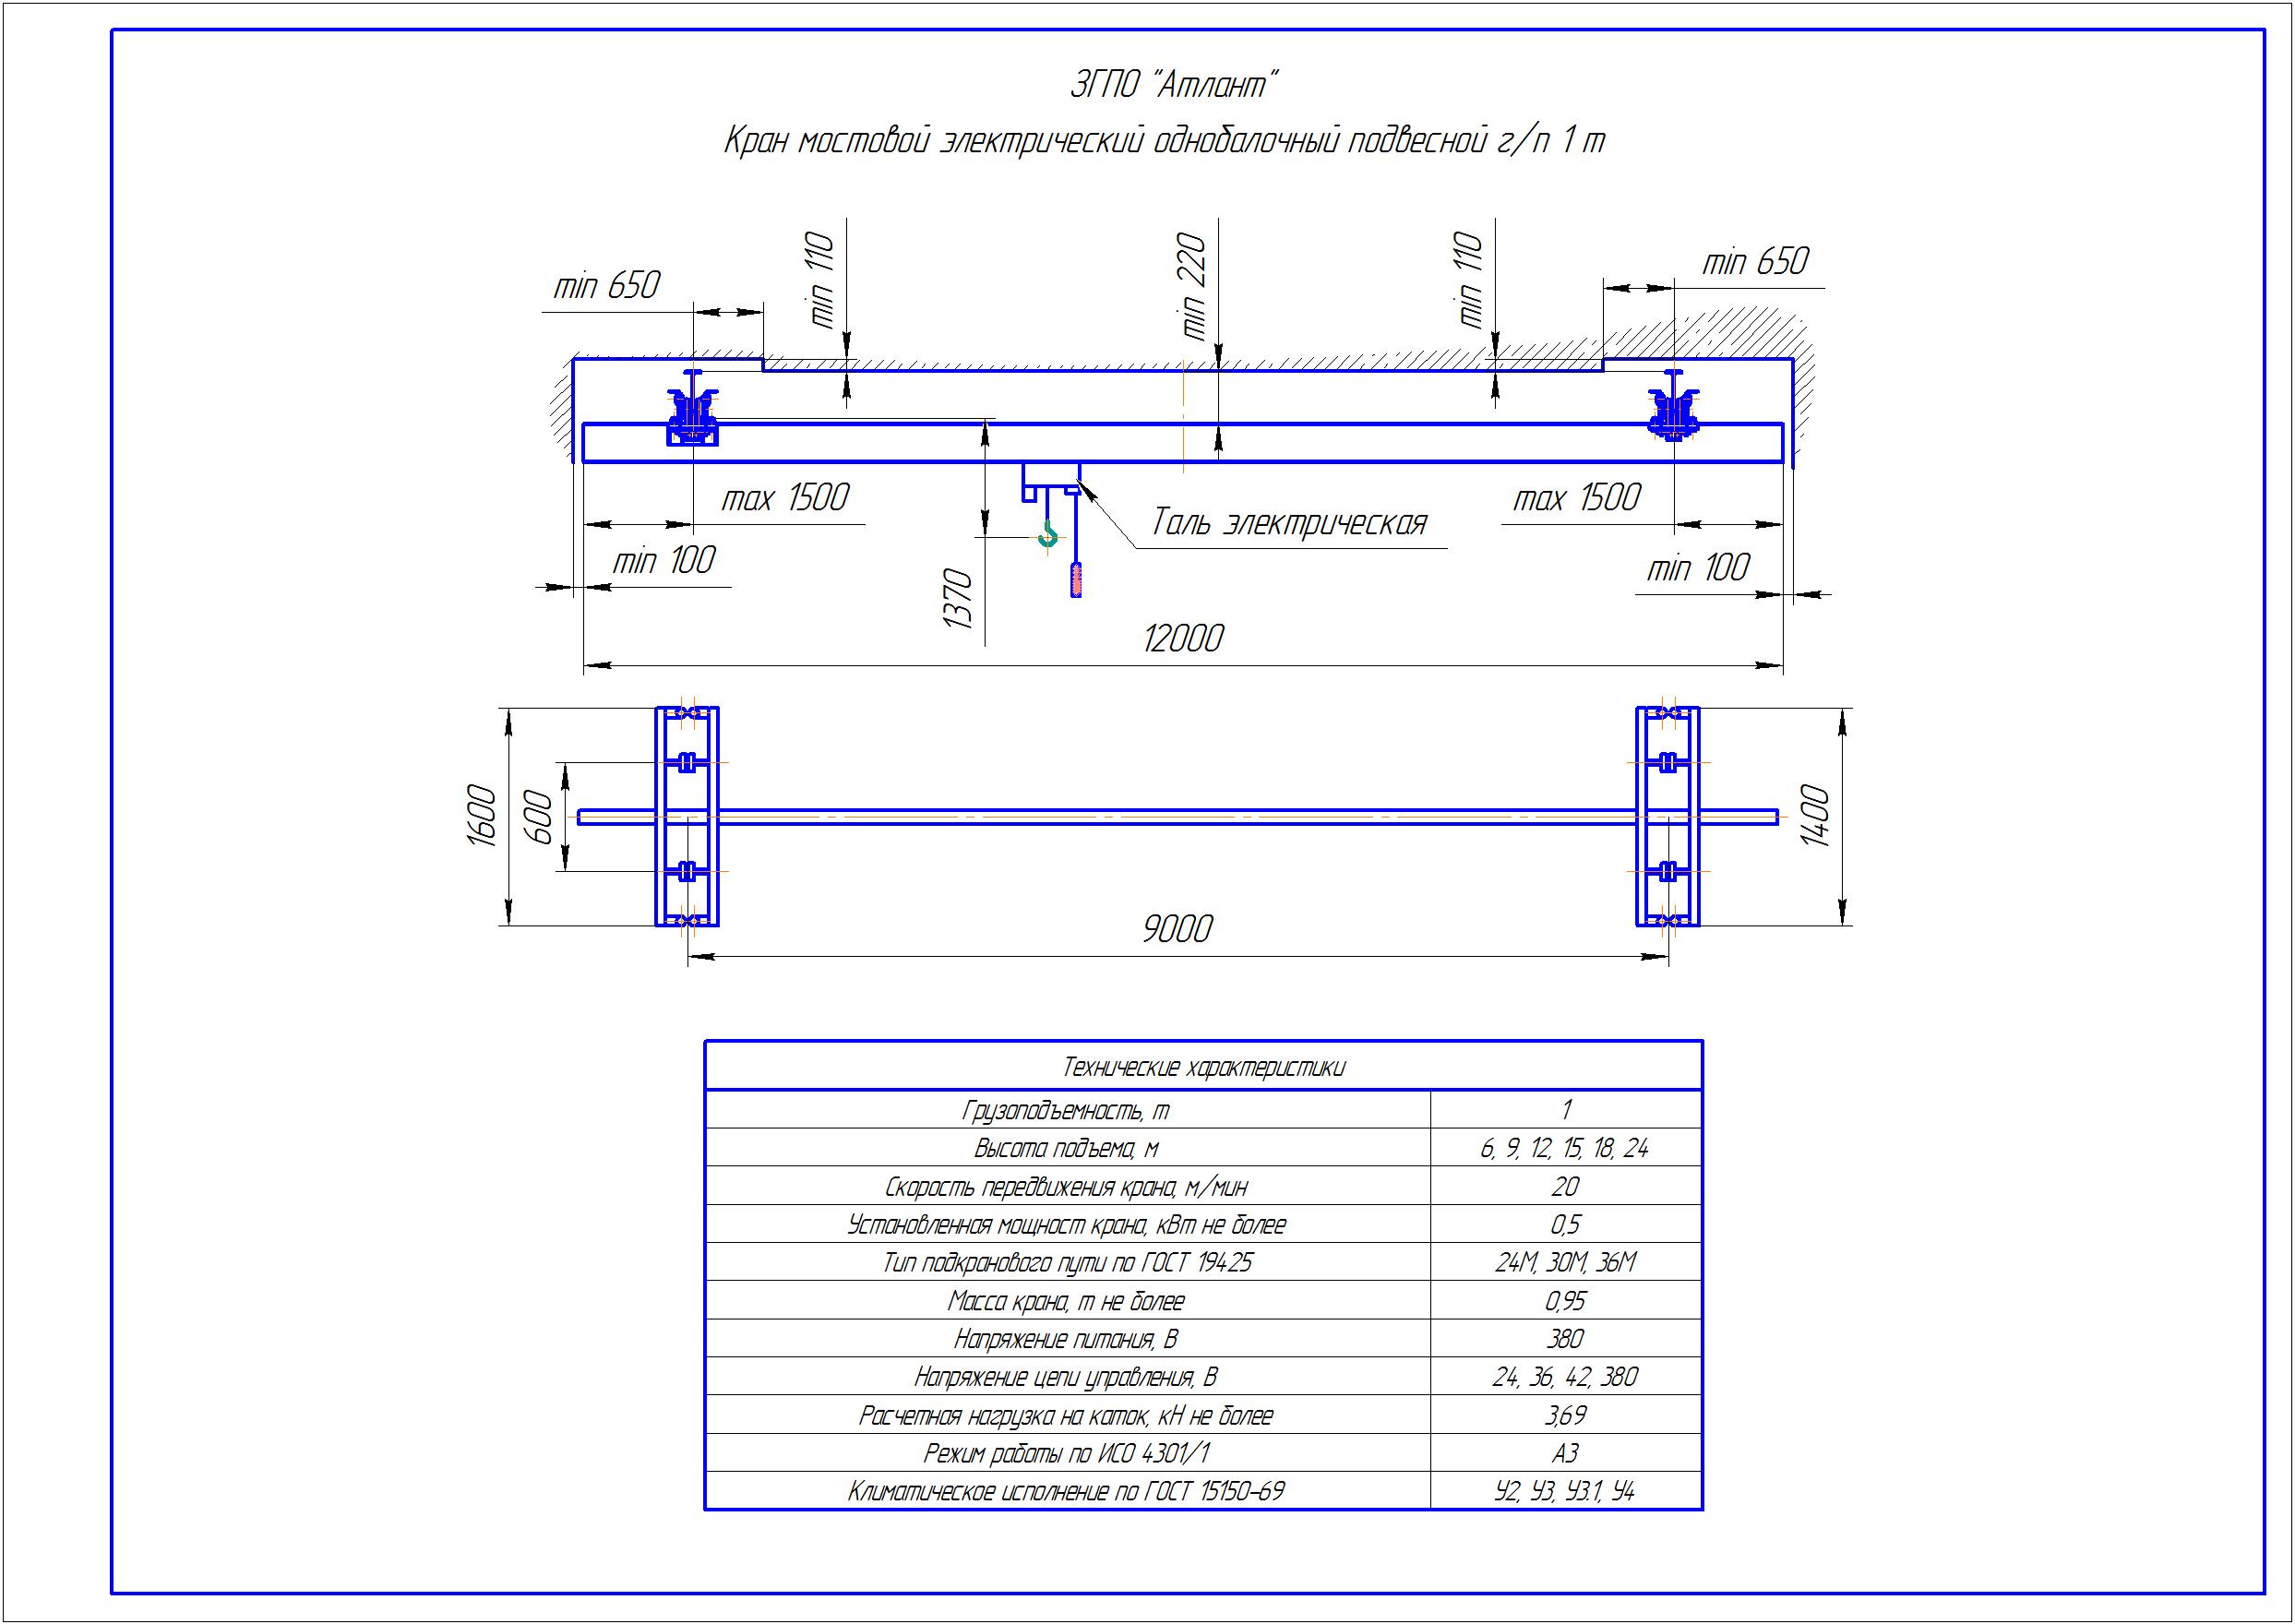 KBP 1 3 - Подвесная кран балка